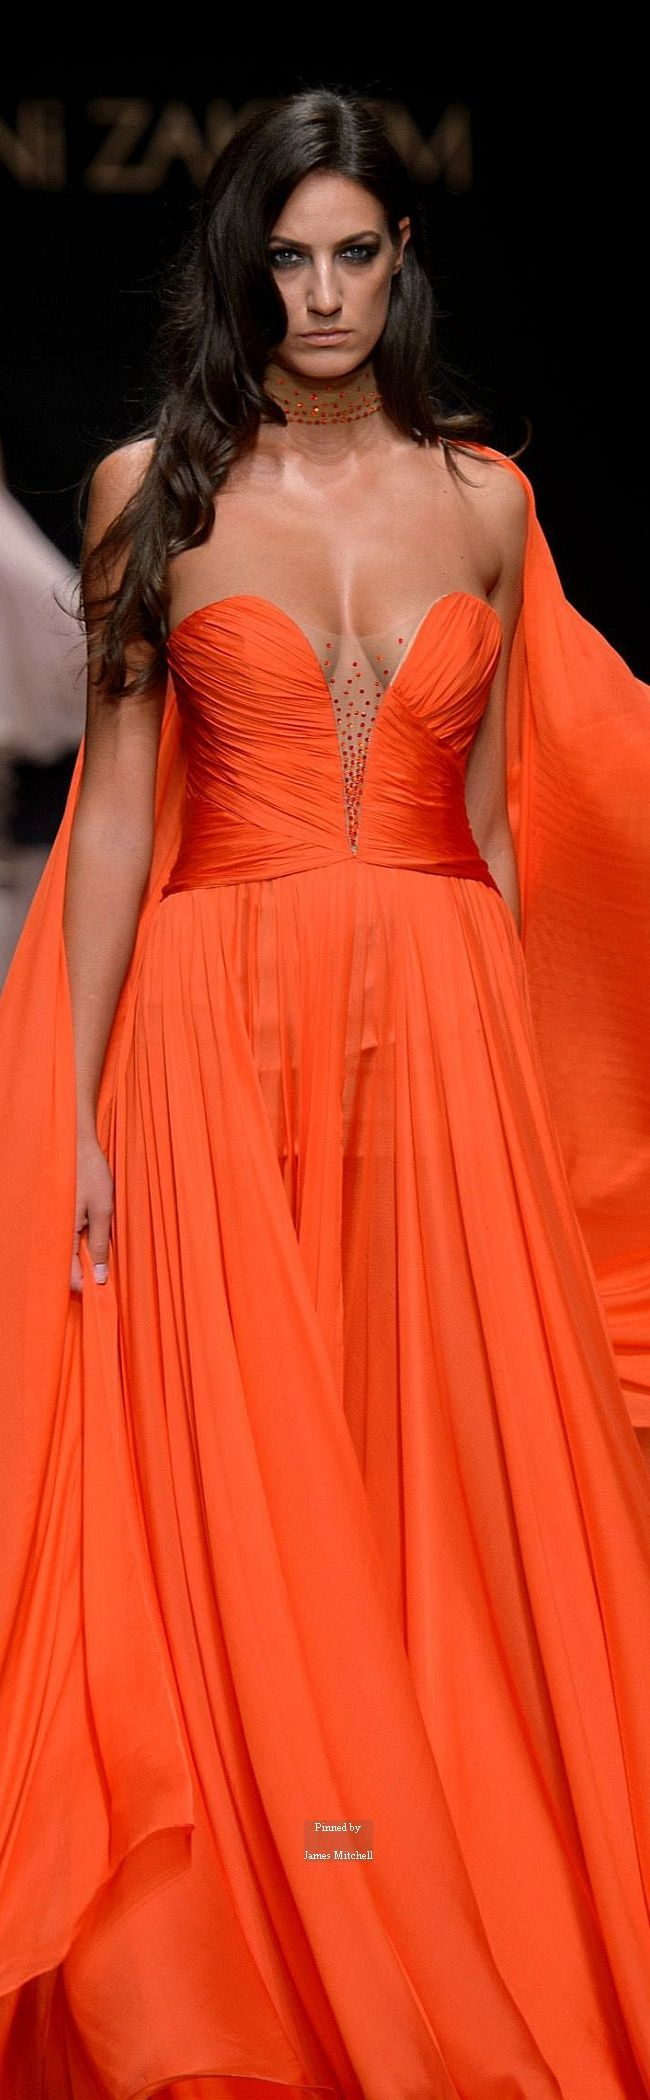 Rani Zakhem ~ Couture Brilliant Orange Strapless Ball Gown Fall 2015-16 |  @ orange like orange